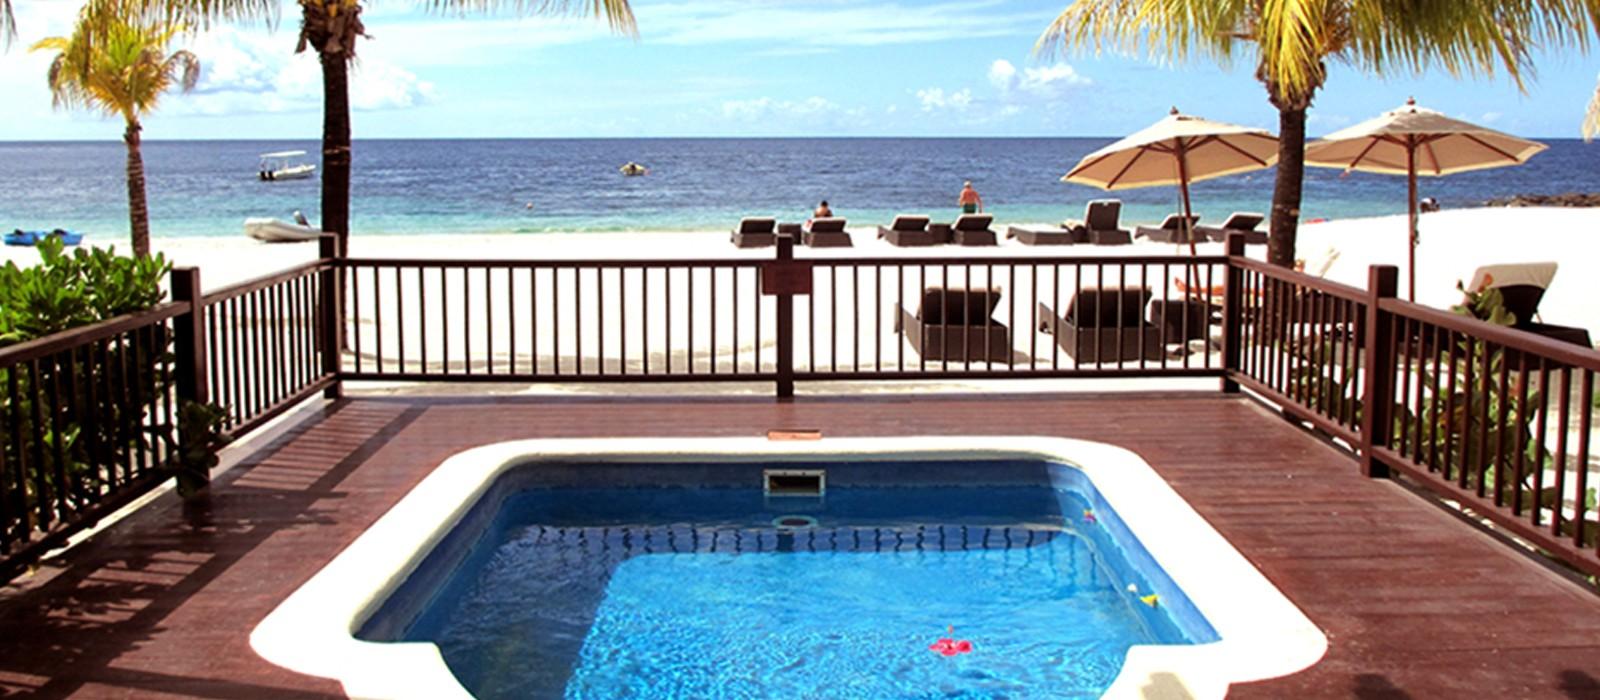 Buccament Bay - Luxury St Vincent Holidays - Header l